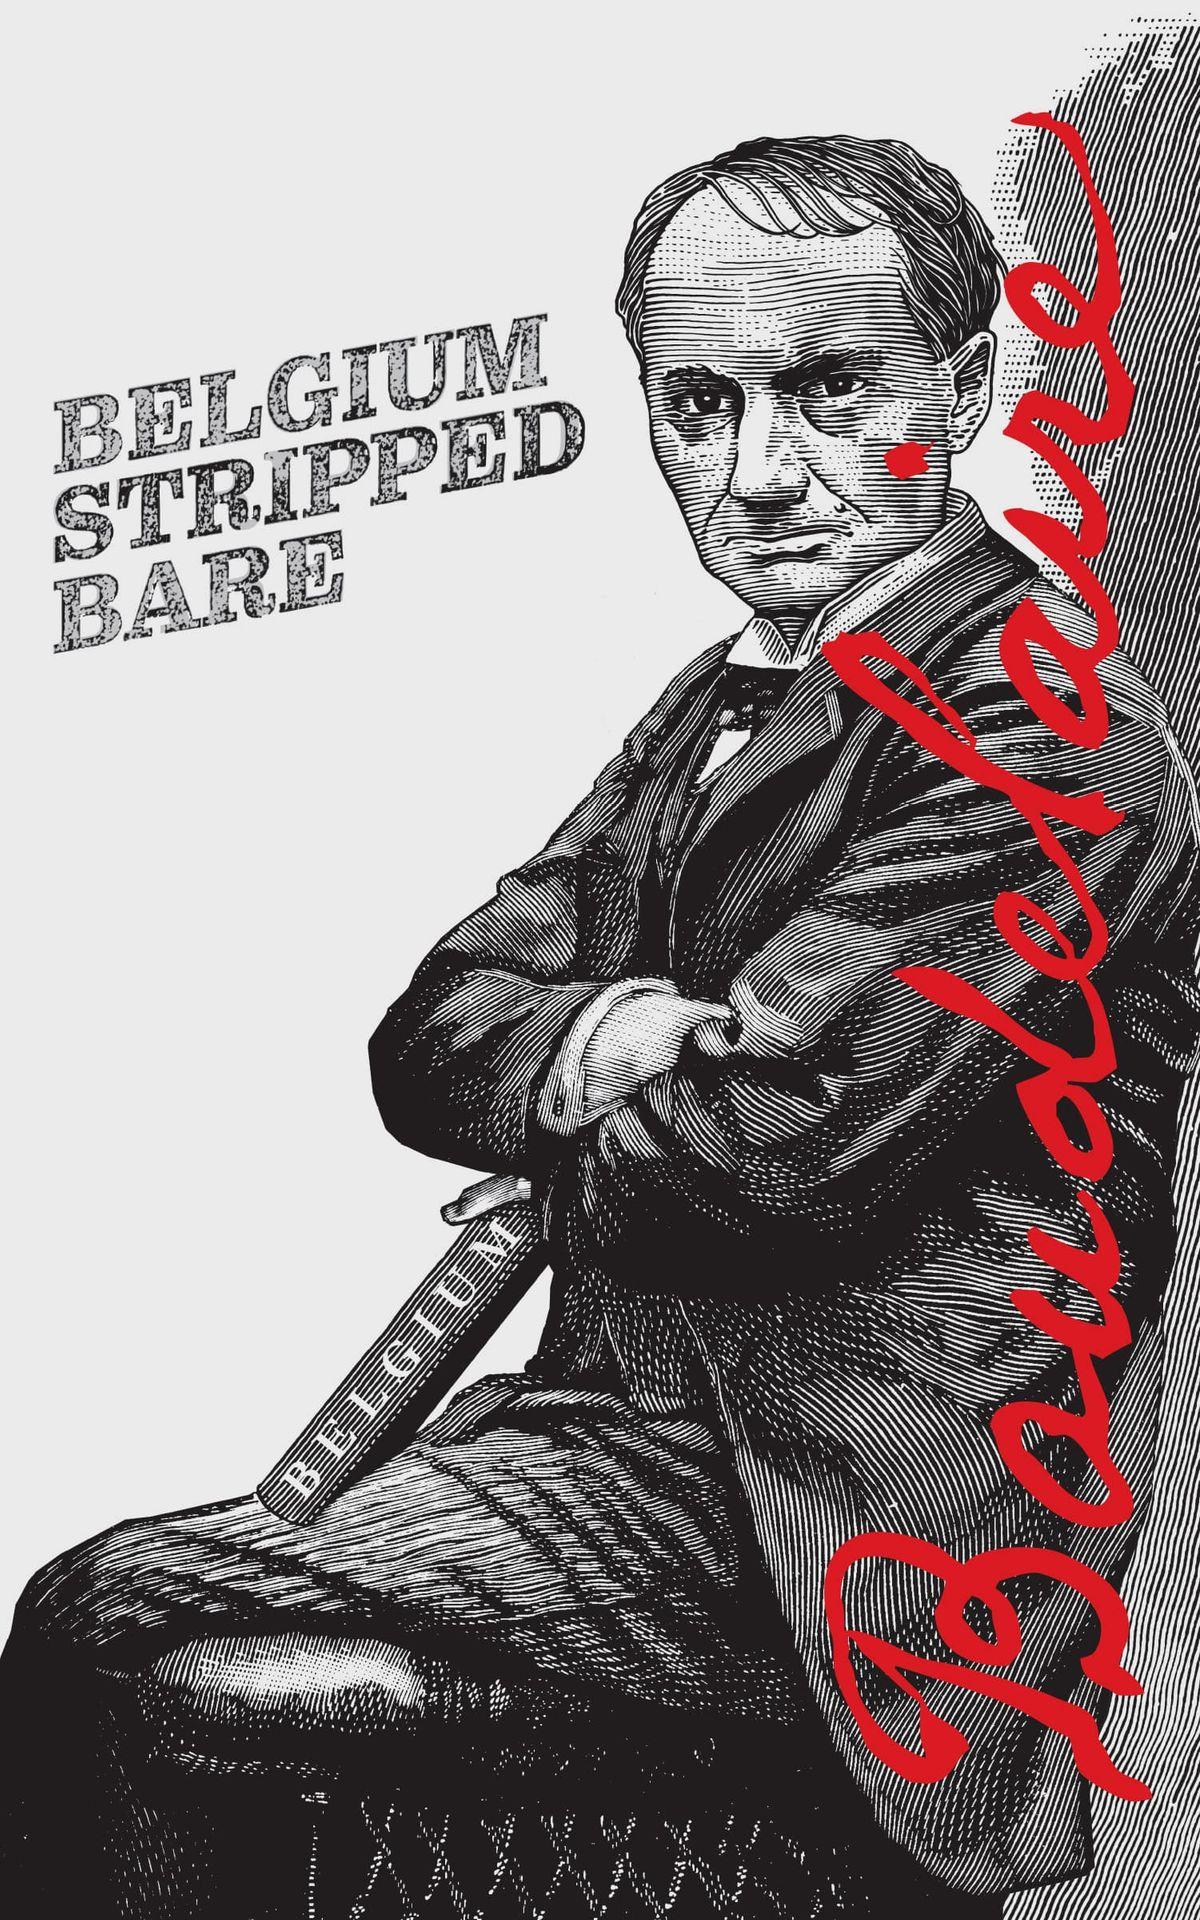 Belgium Stripped Bare